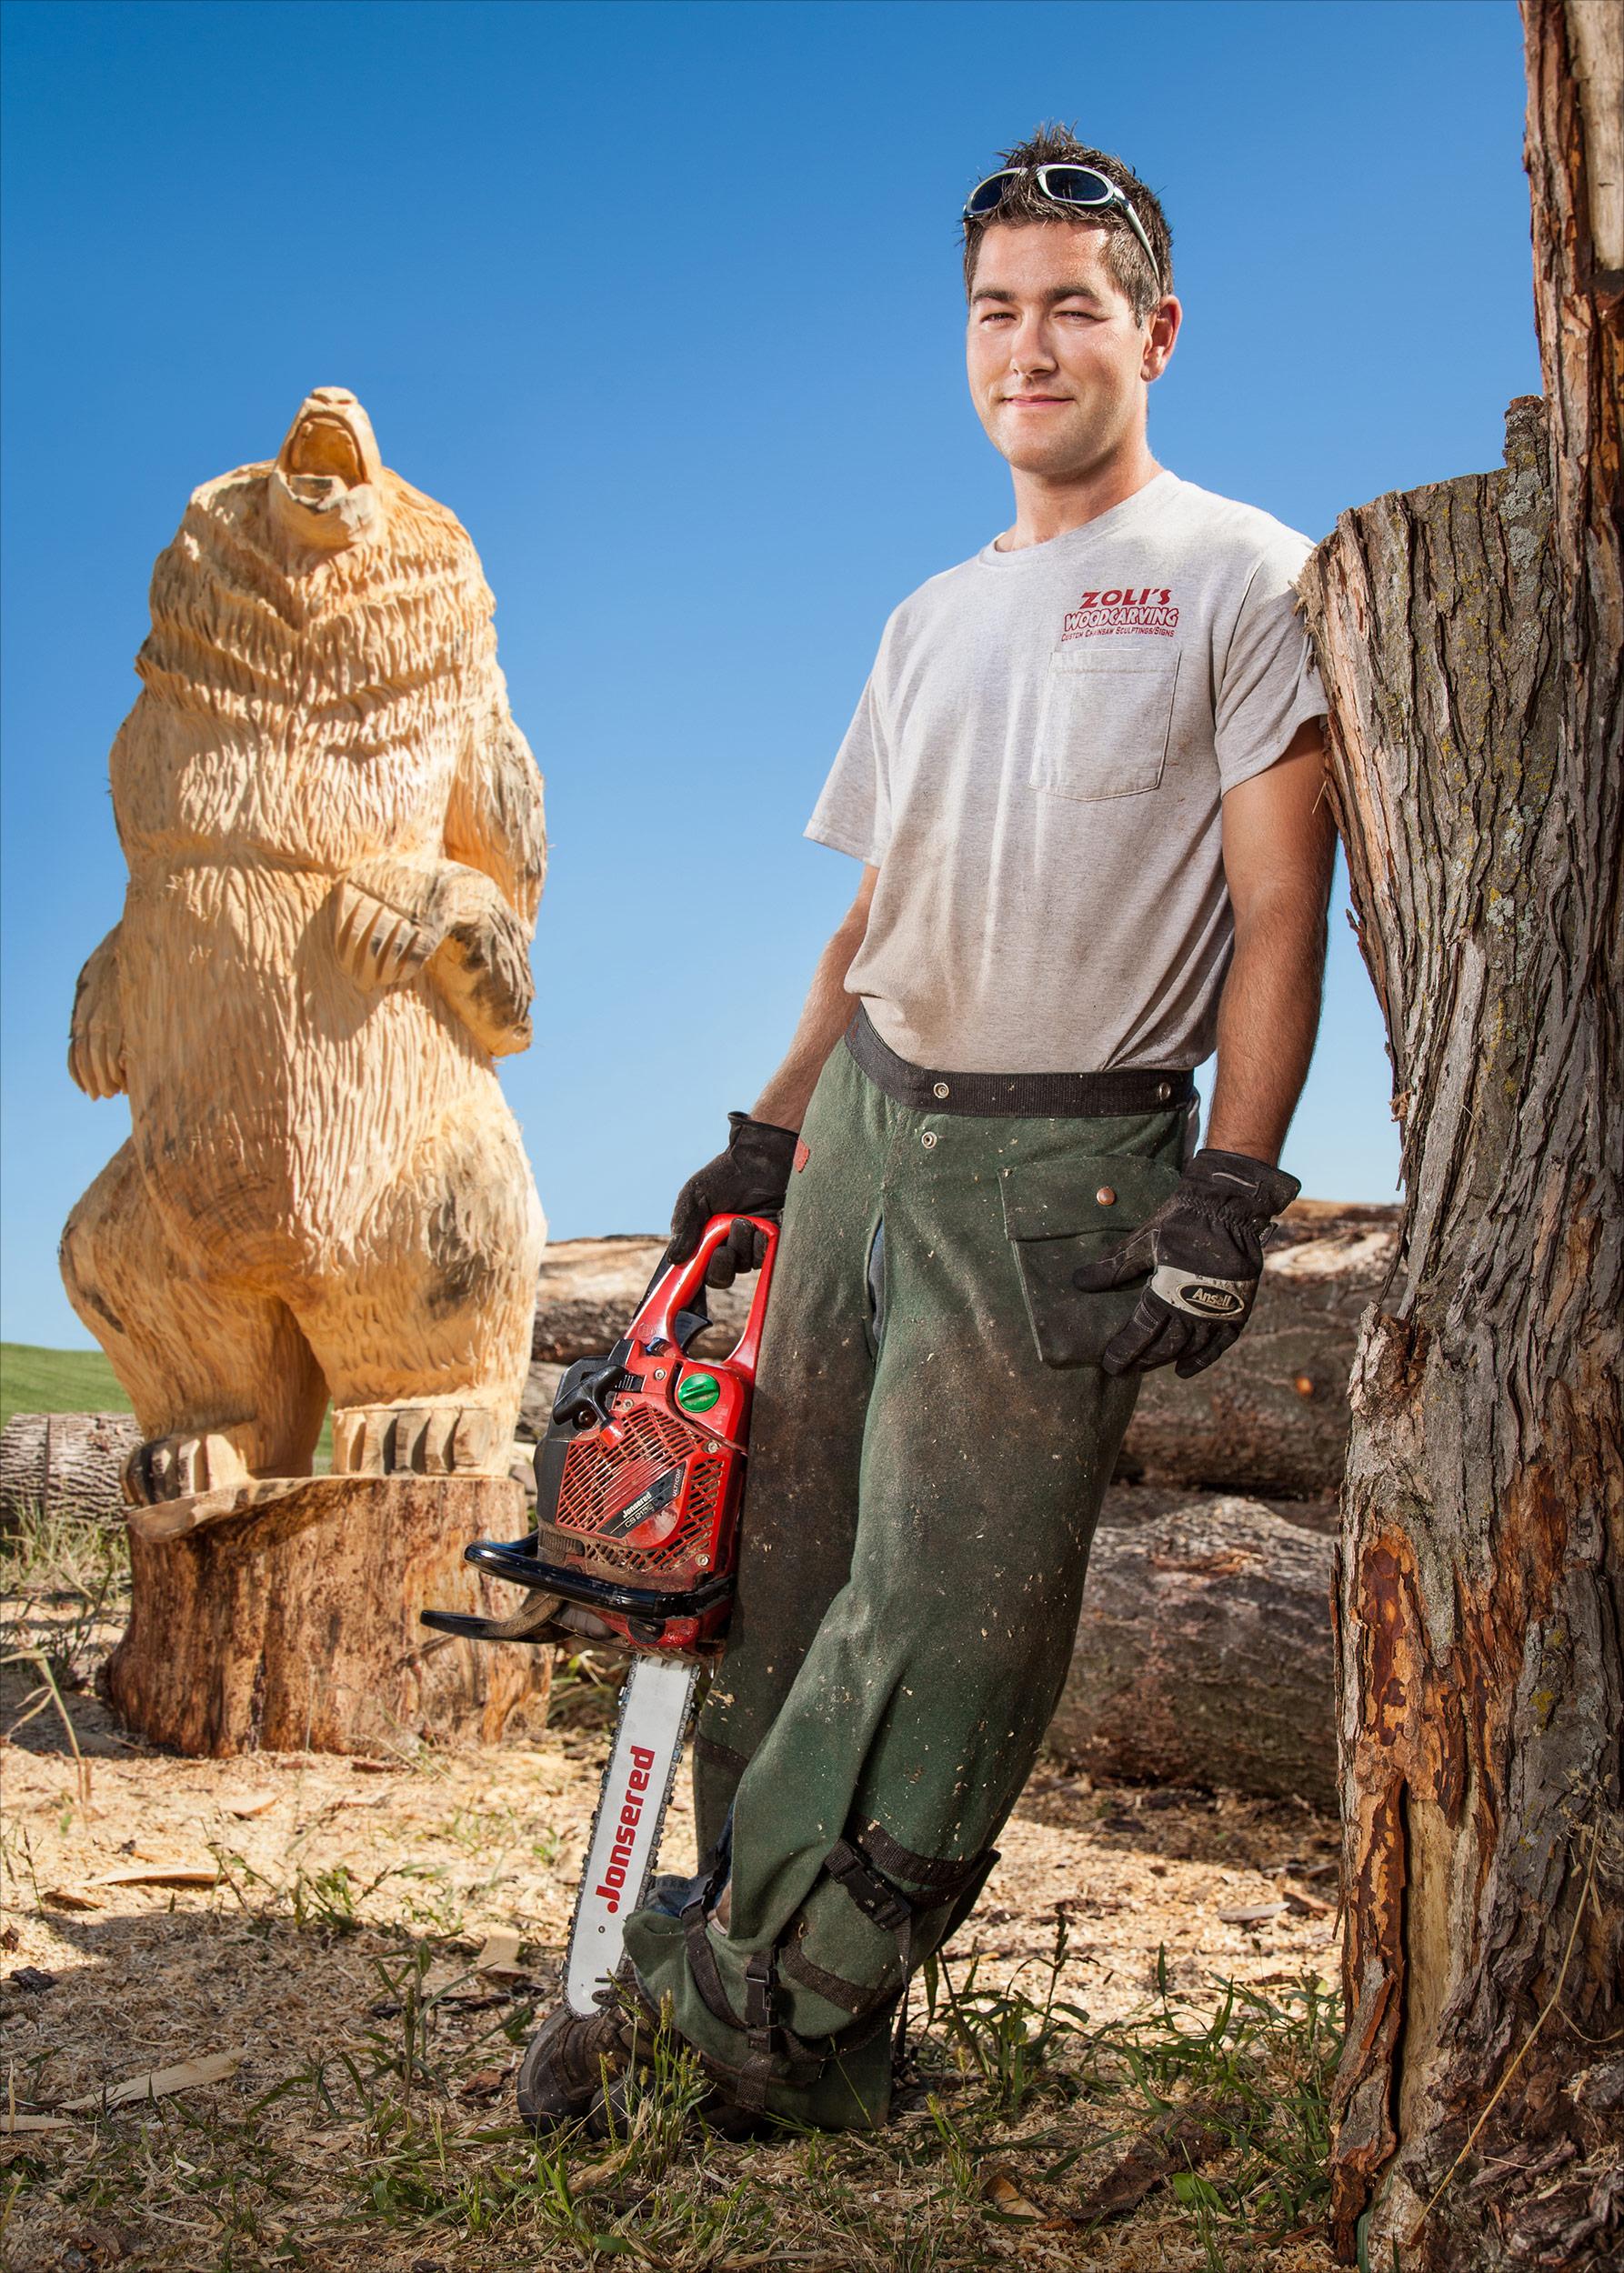 Zoli Akacsos, chainsaw sculptor